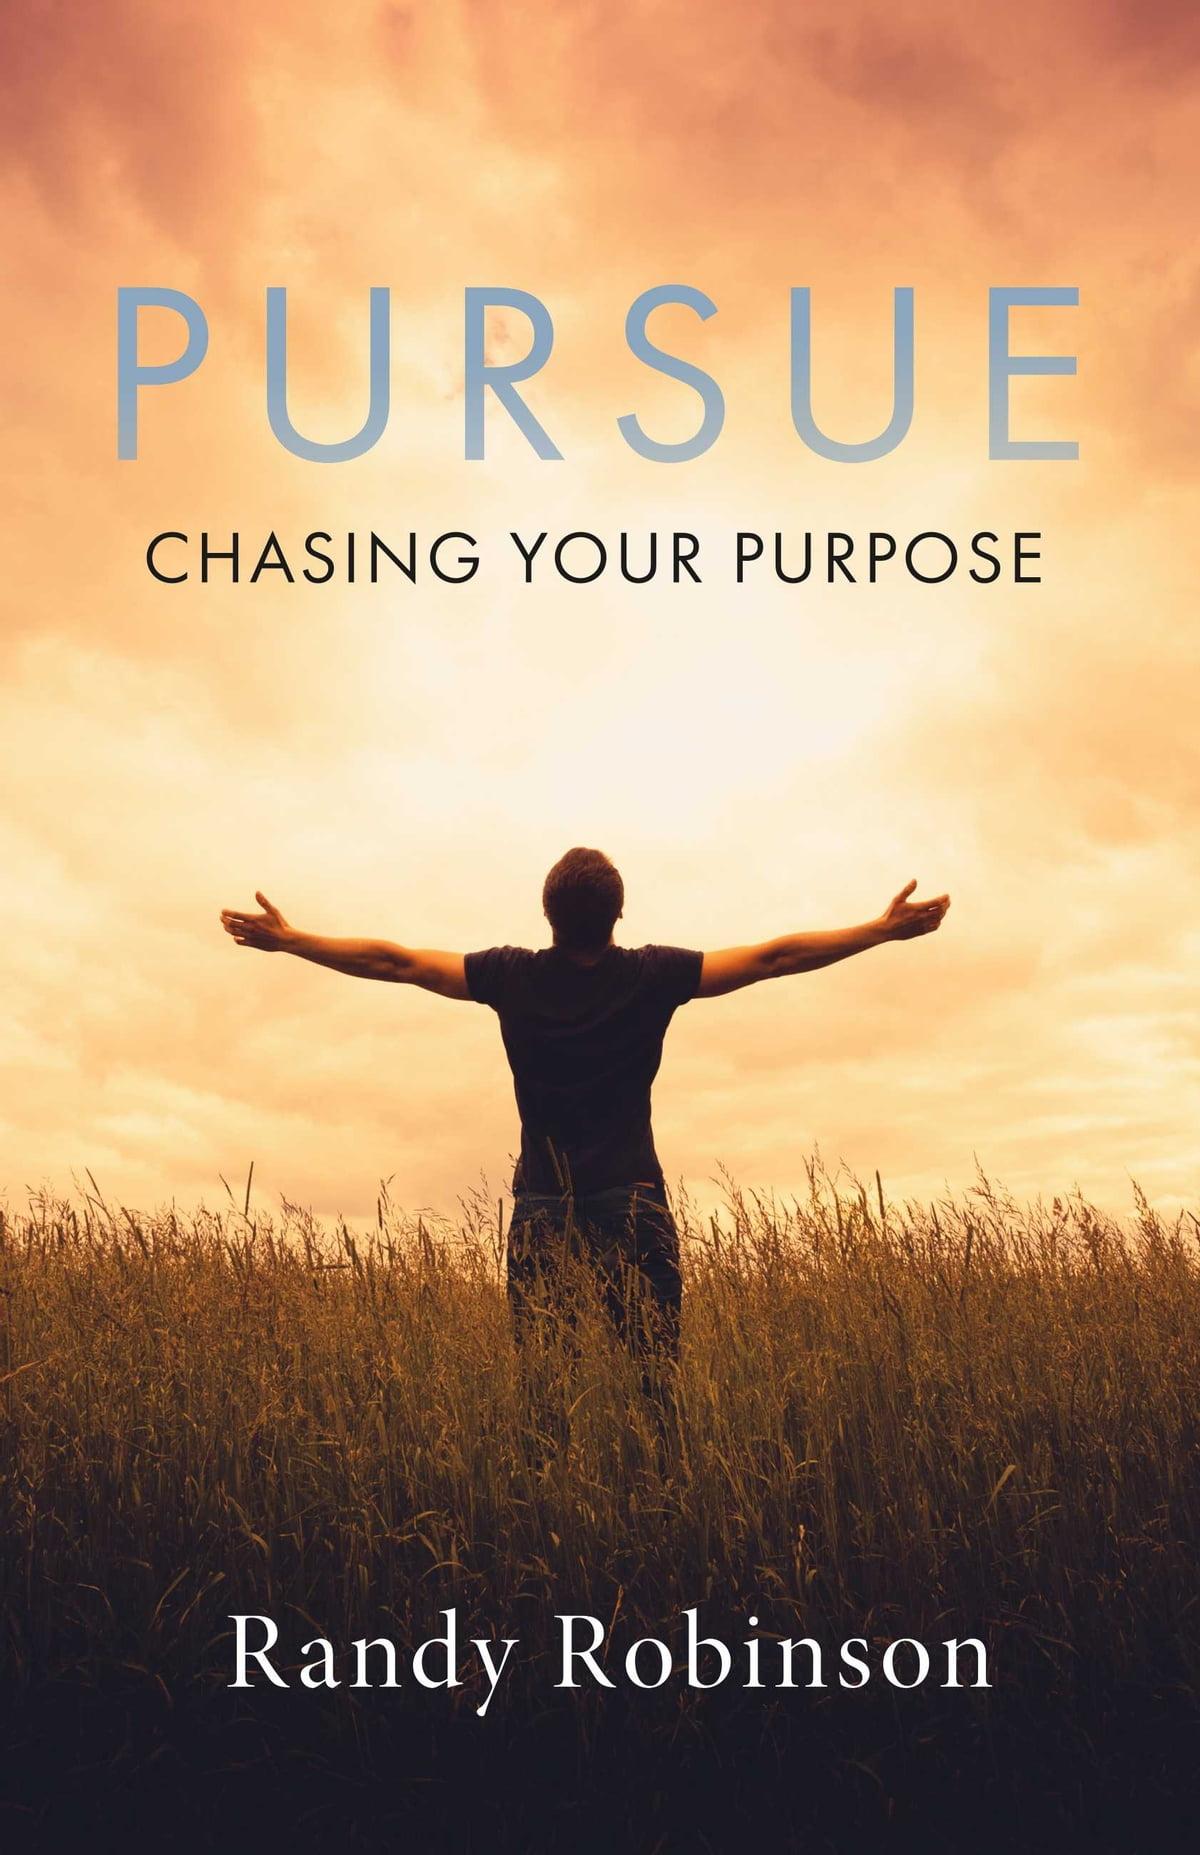 Pursue eBook by Randy Robinson - 9781543902938 | Rakuten Kobo